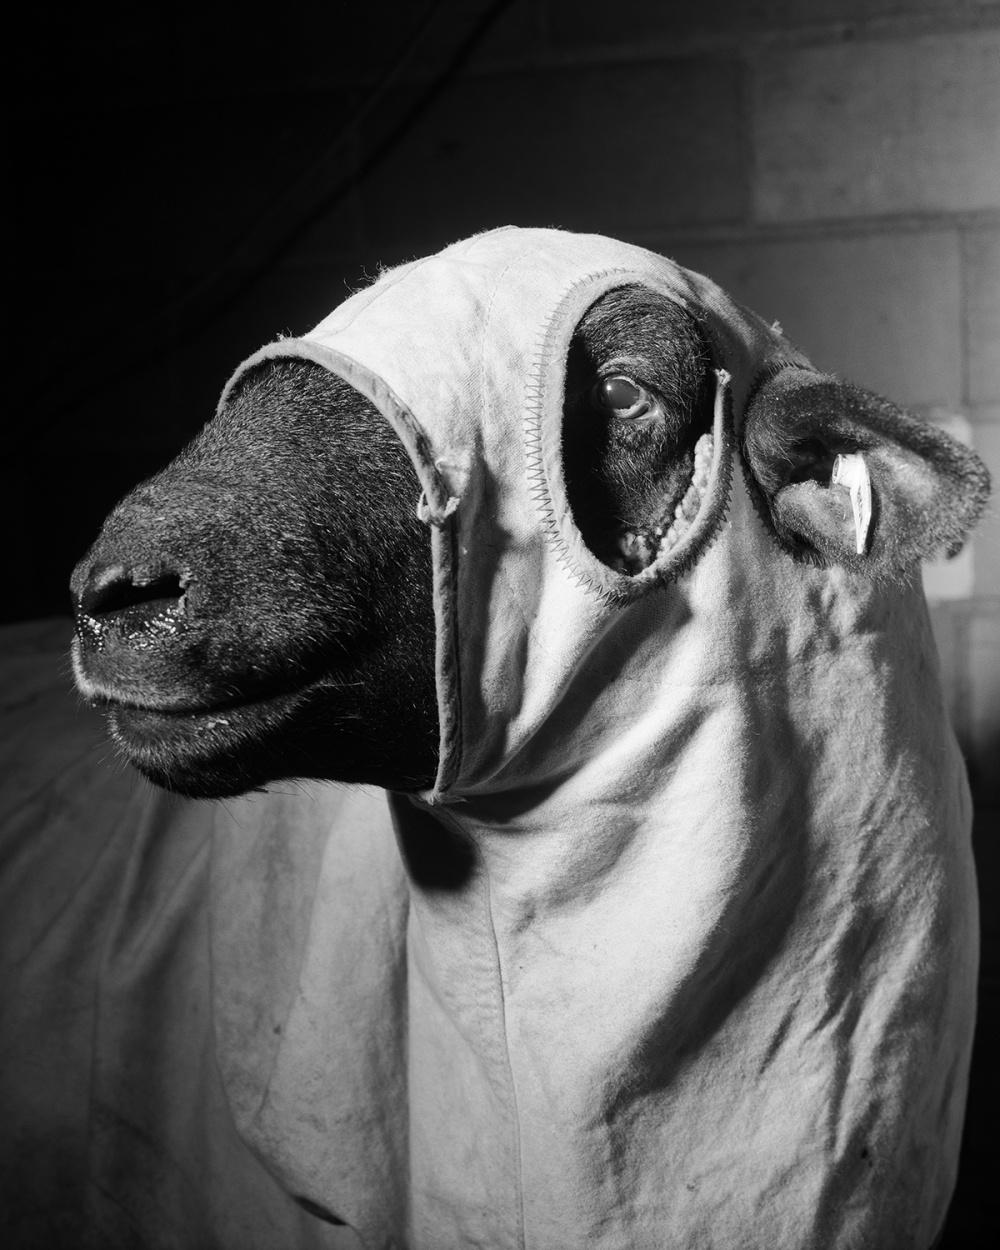 Alec Soth, Sheep, 1996. Archival pigment print, 24 x 30